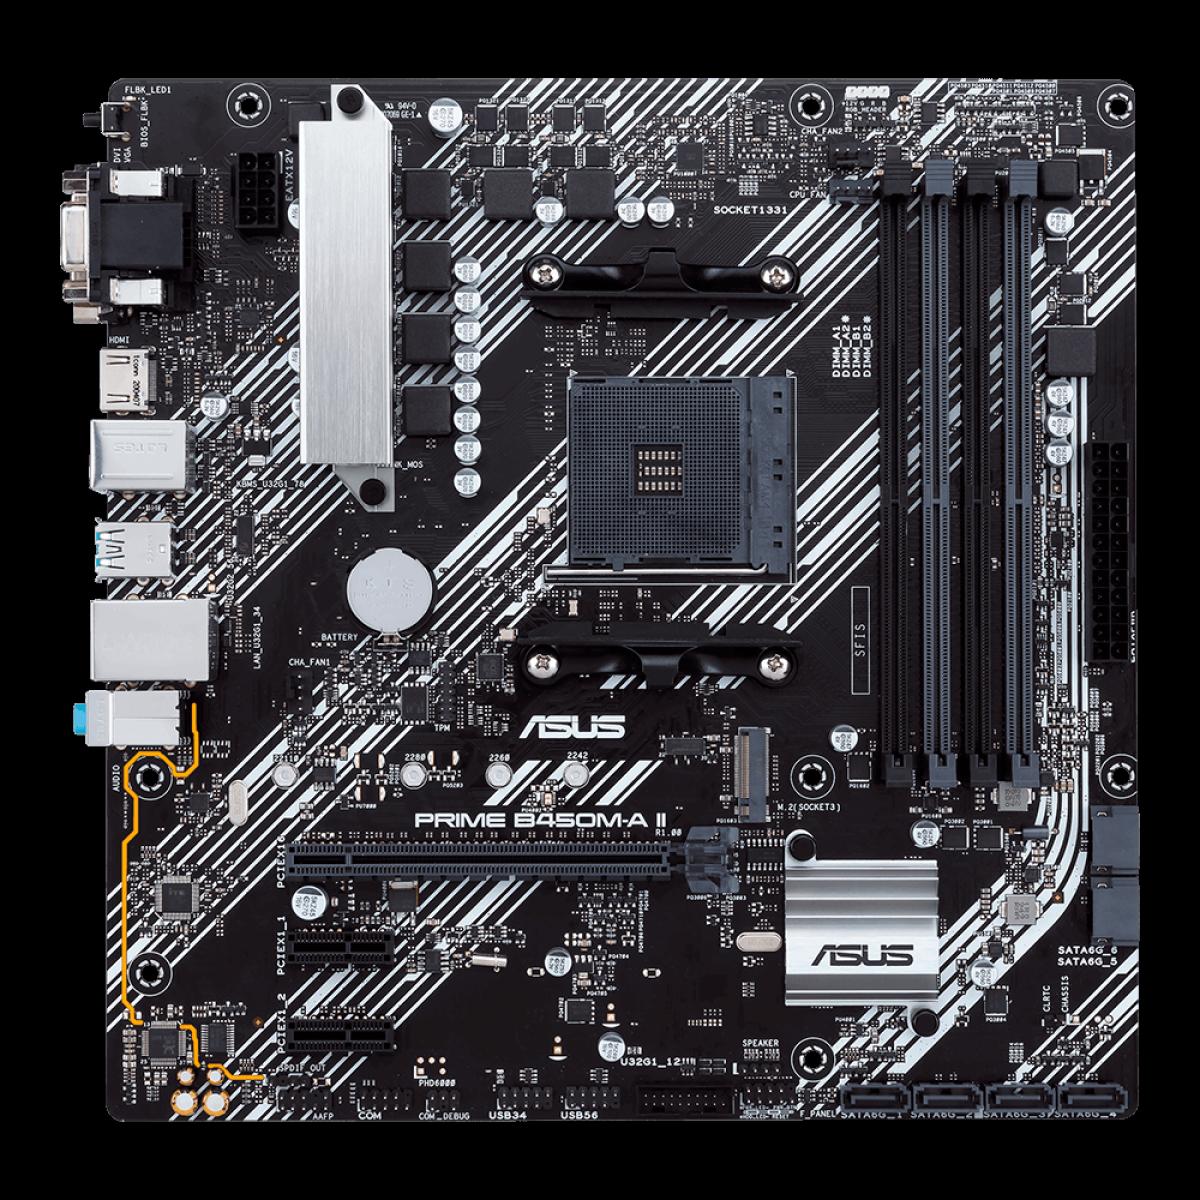 Placa Mãe Asus Prime B450M-A II, Chipset B450, AMD AM4, mATX, DDR4, 90MB15Z0-M0EAY0